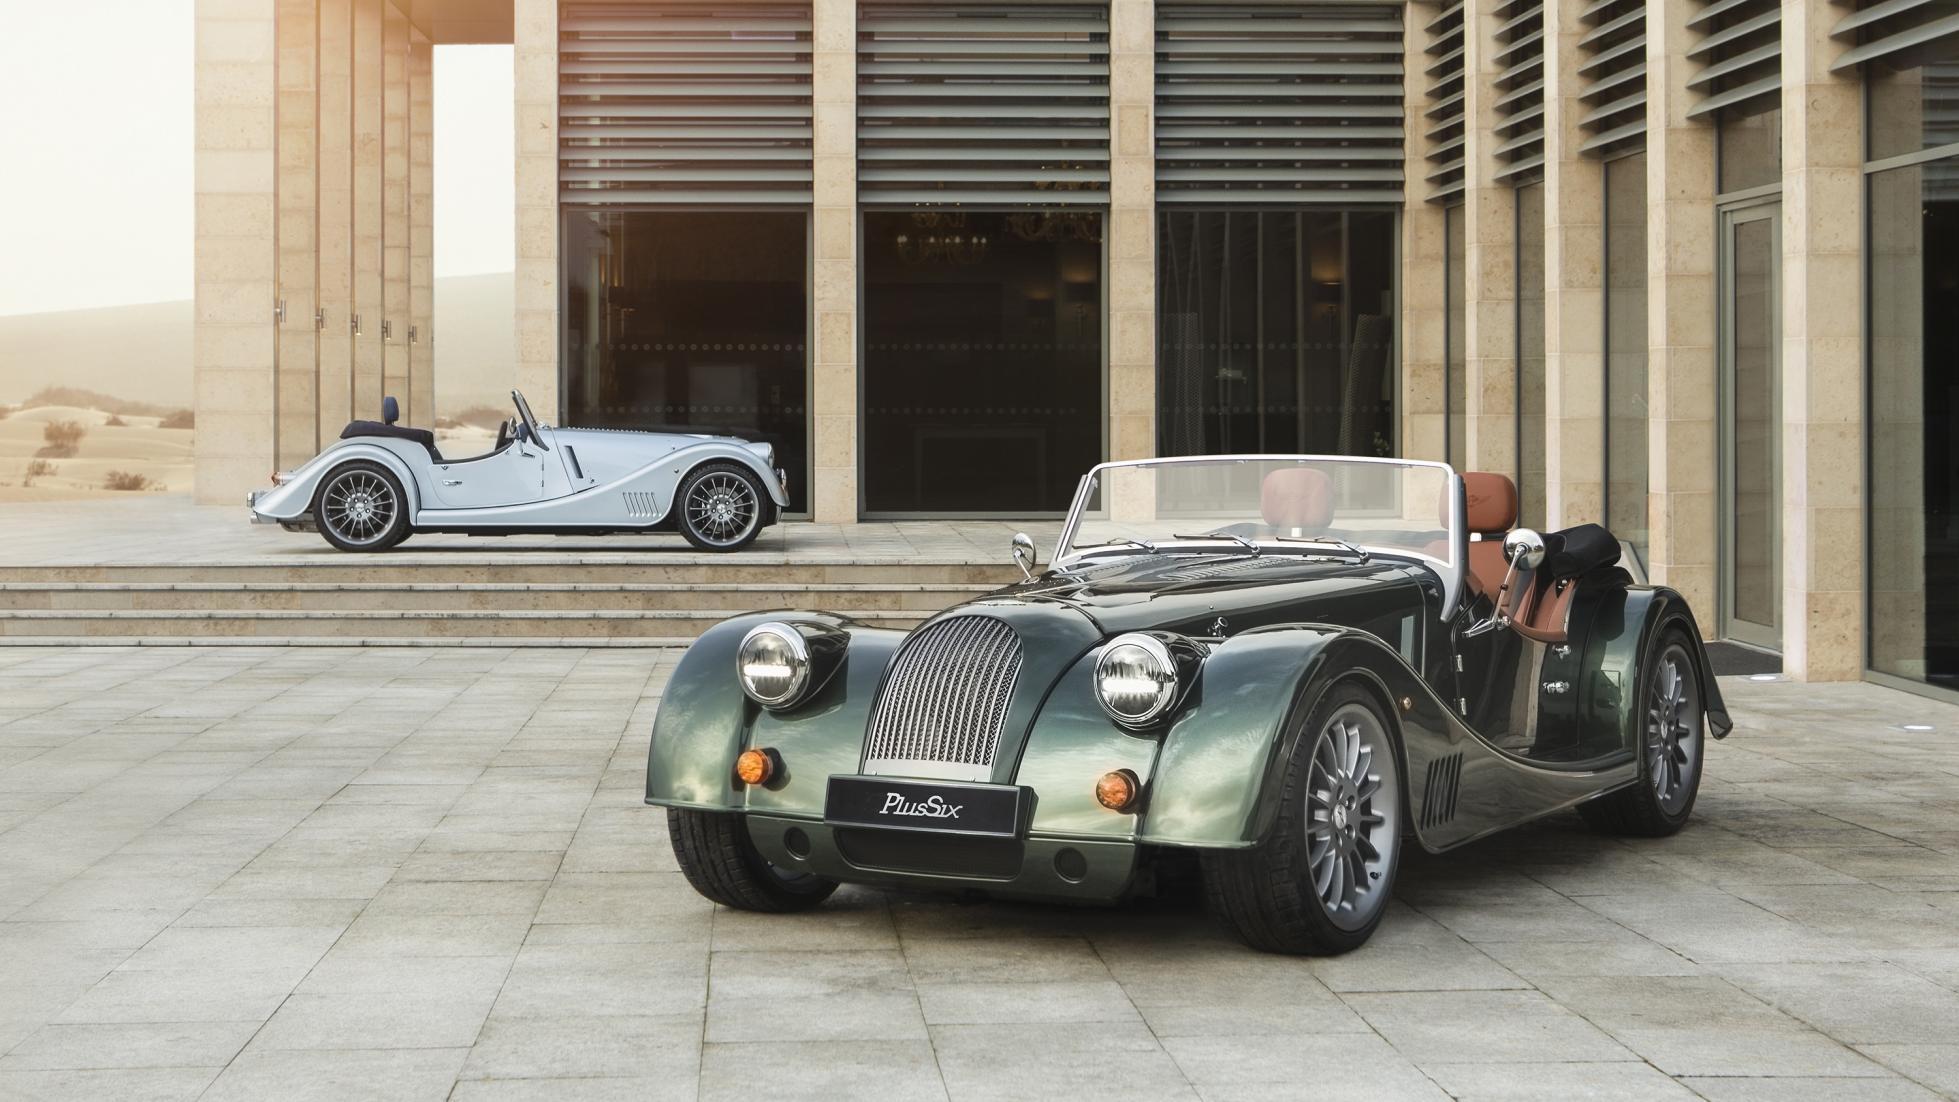 Morgan Plus Six  green and silver